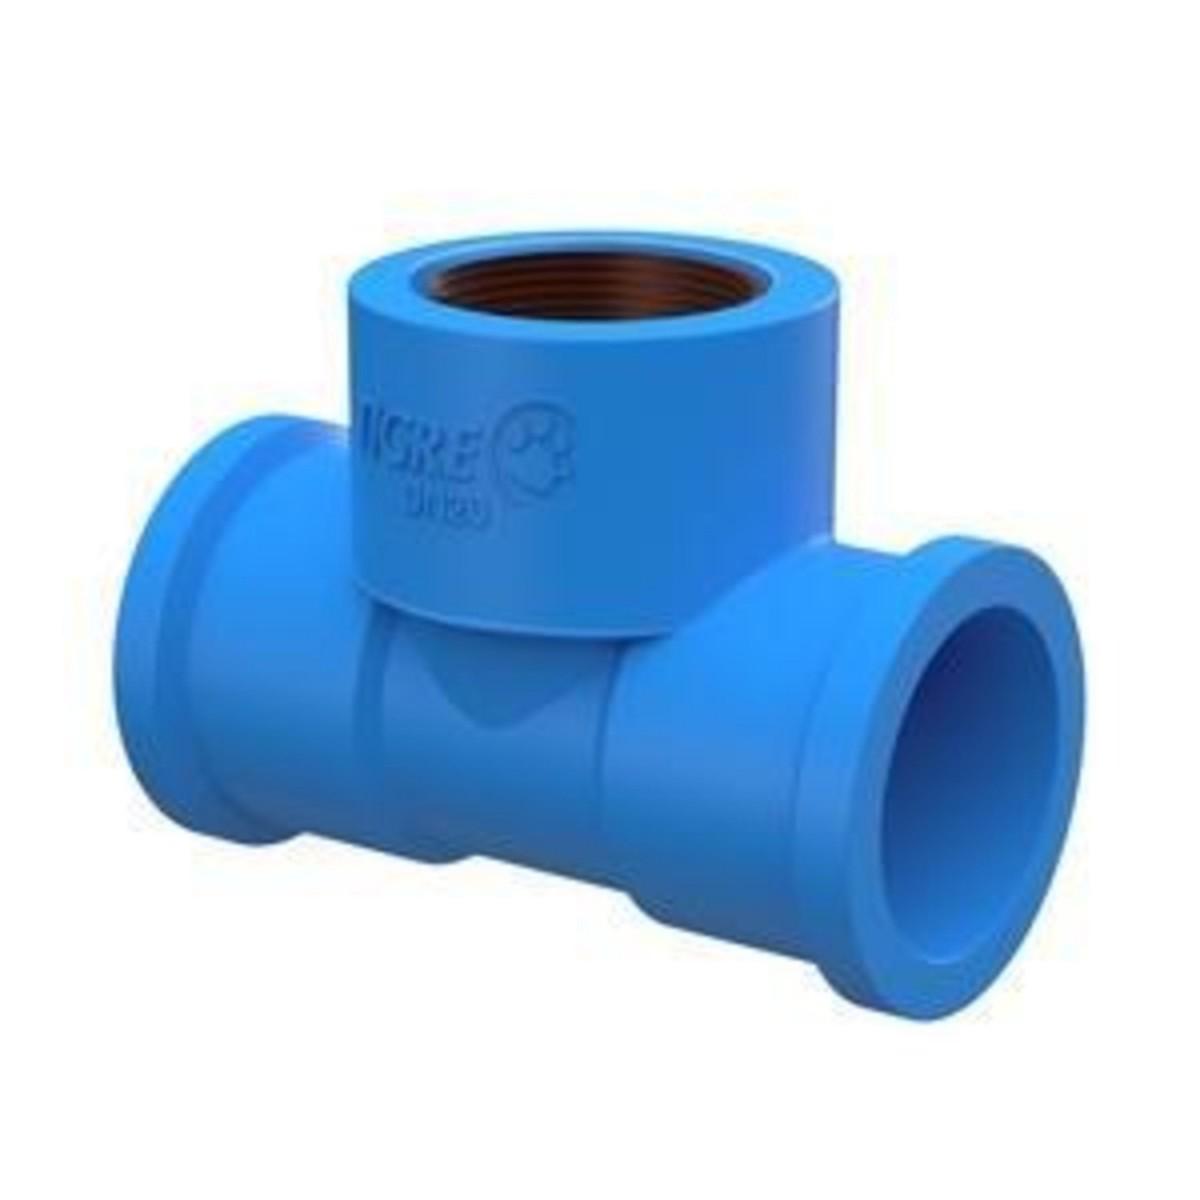 Solda Azul Tê Com Bucha de Latão 20mmx1/2  Tigre